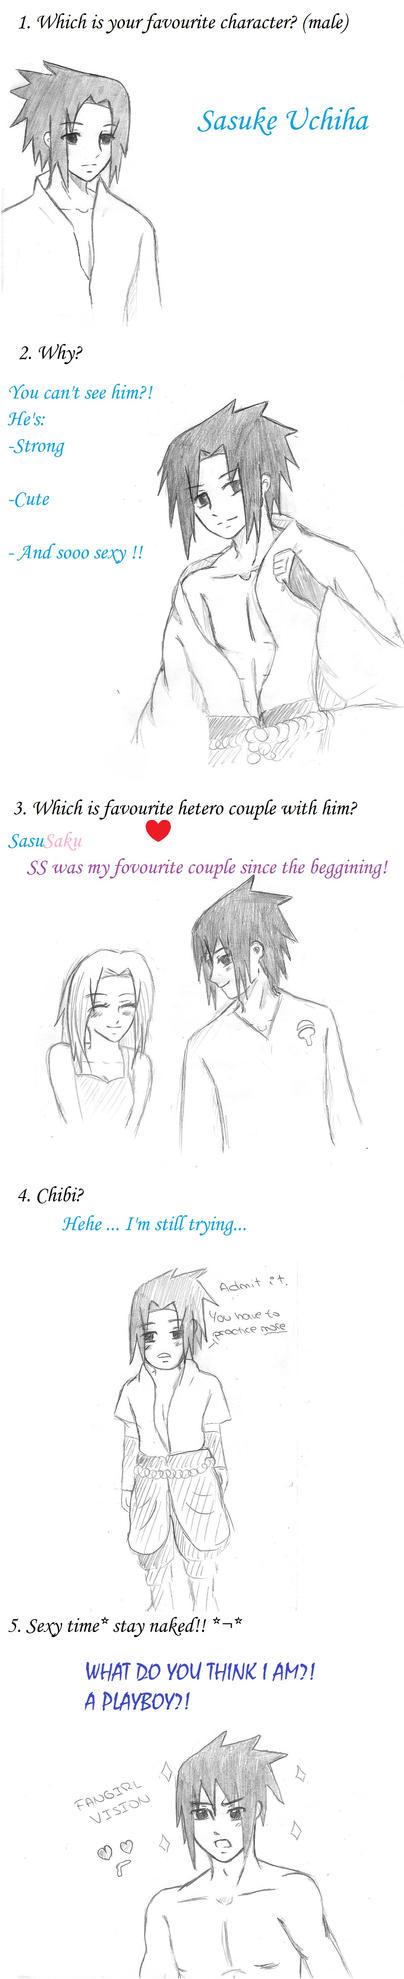 Favourite Character Meme by HitoriLoveNejiHina